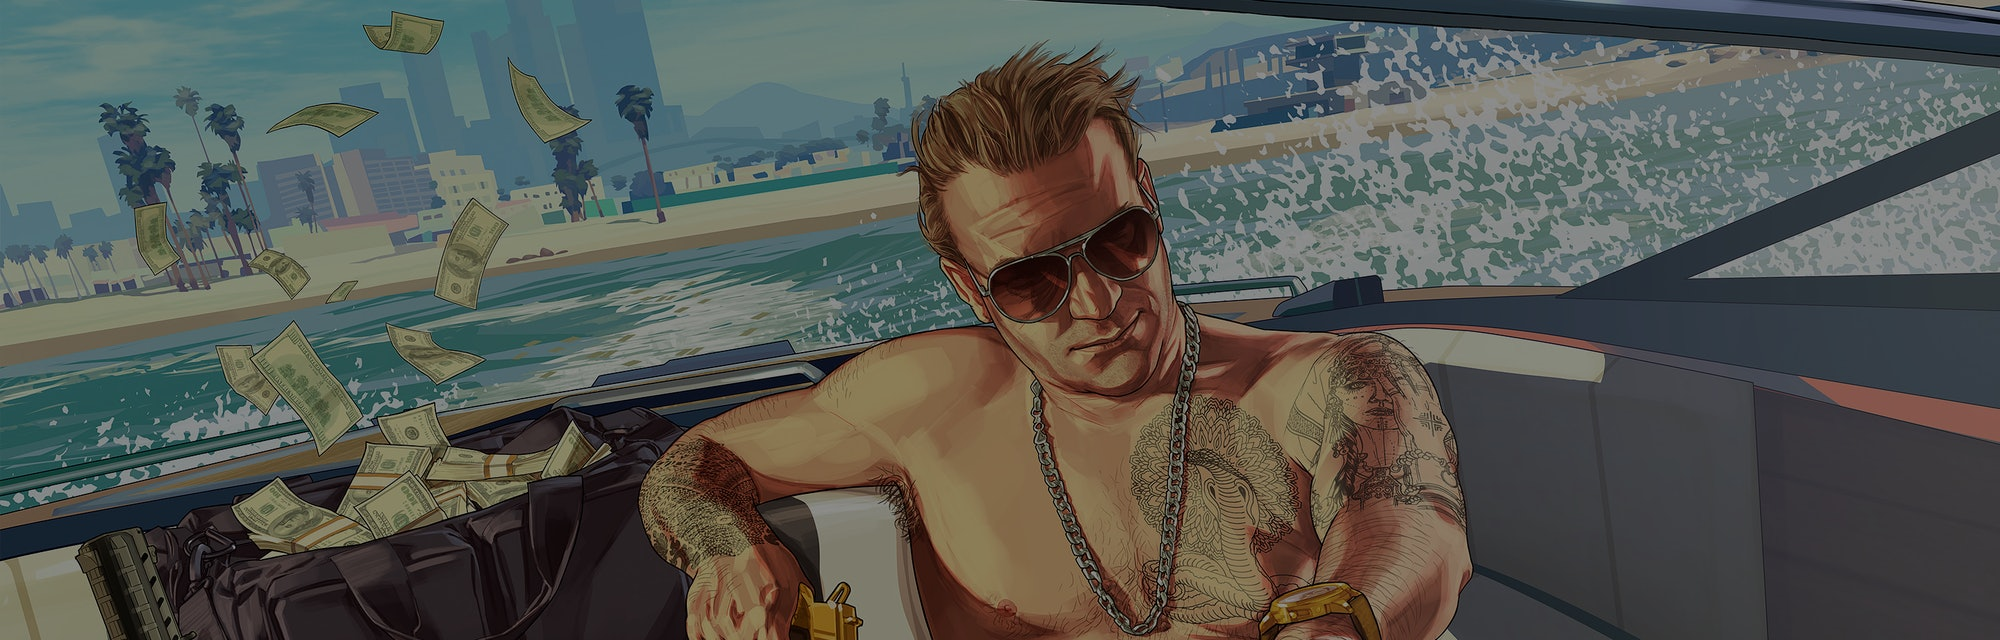 Gta 5 Free Epic Games Store Leak Hints Rockstar Smash May Go Free To Play